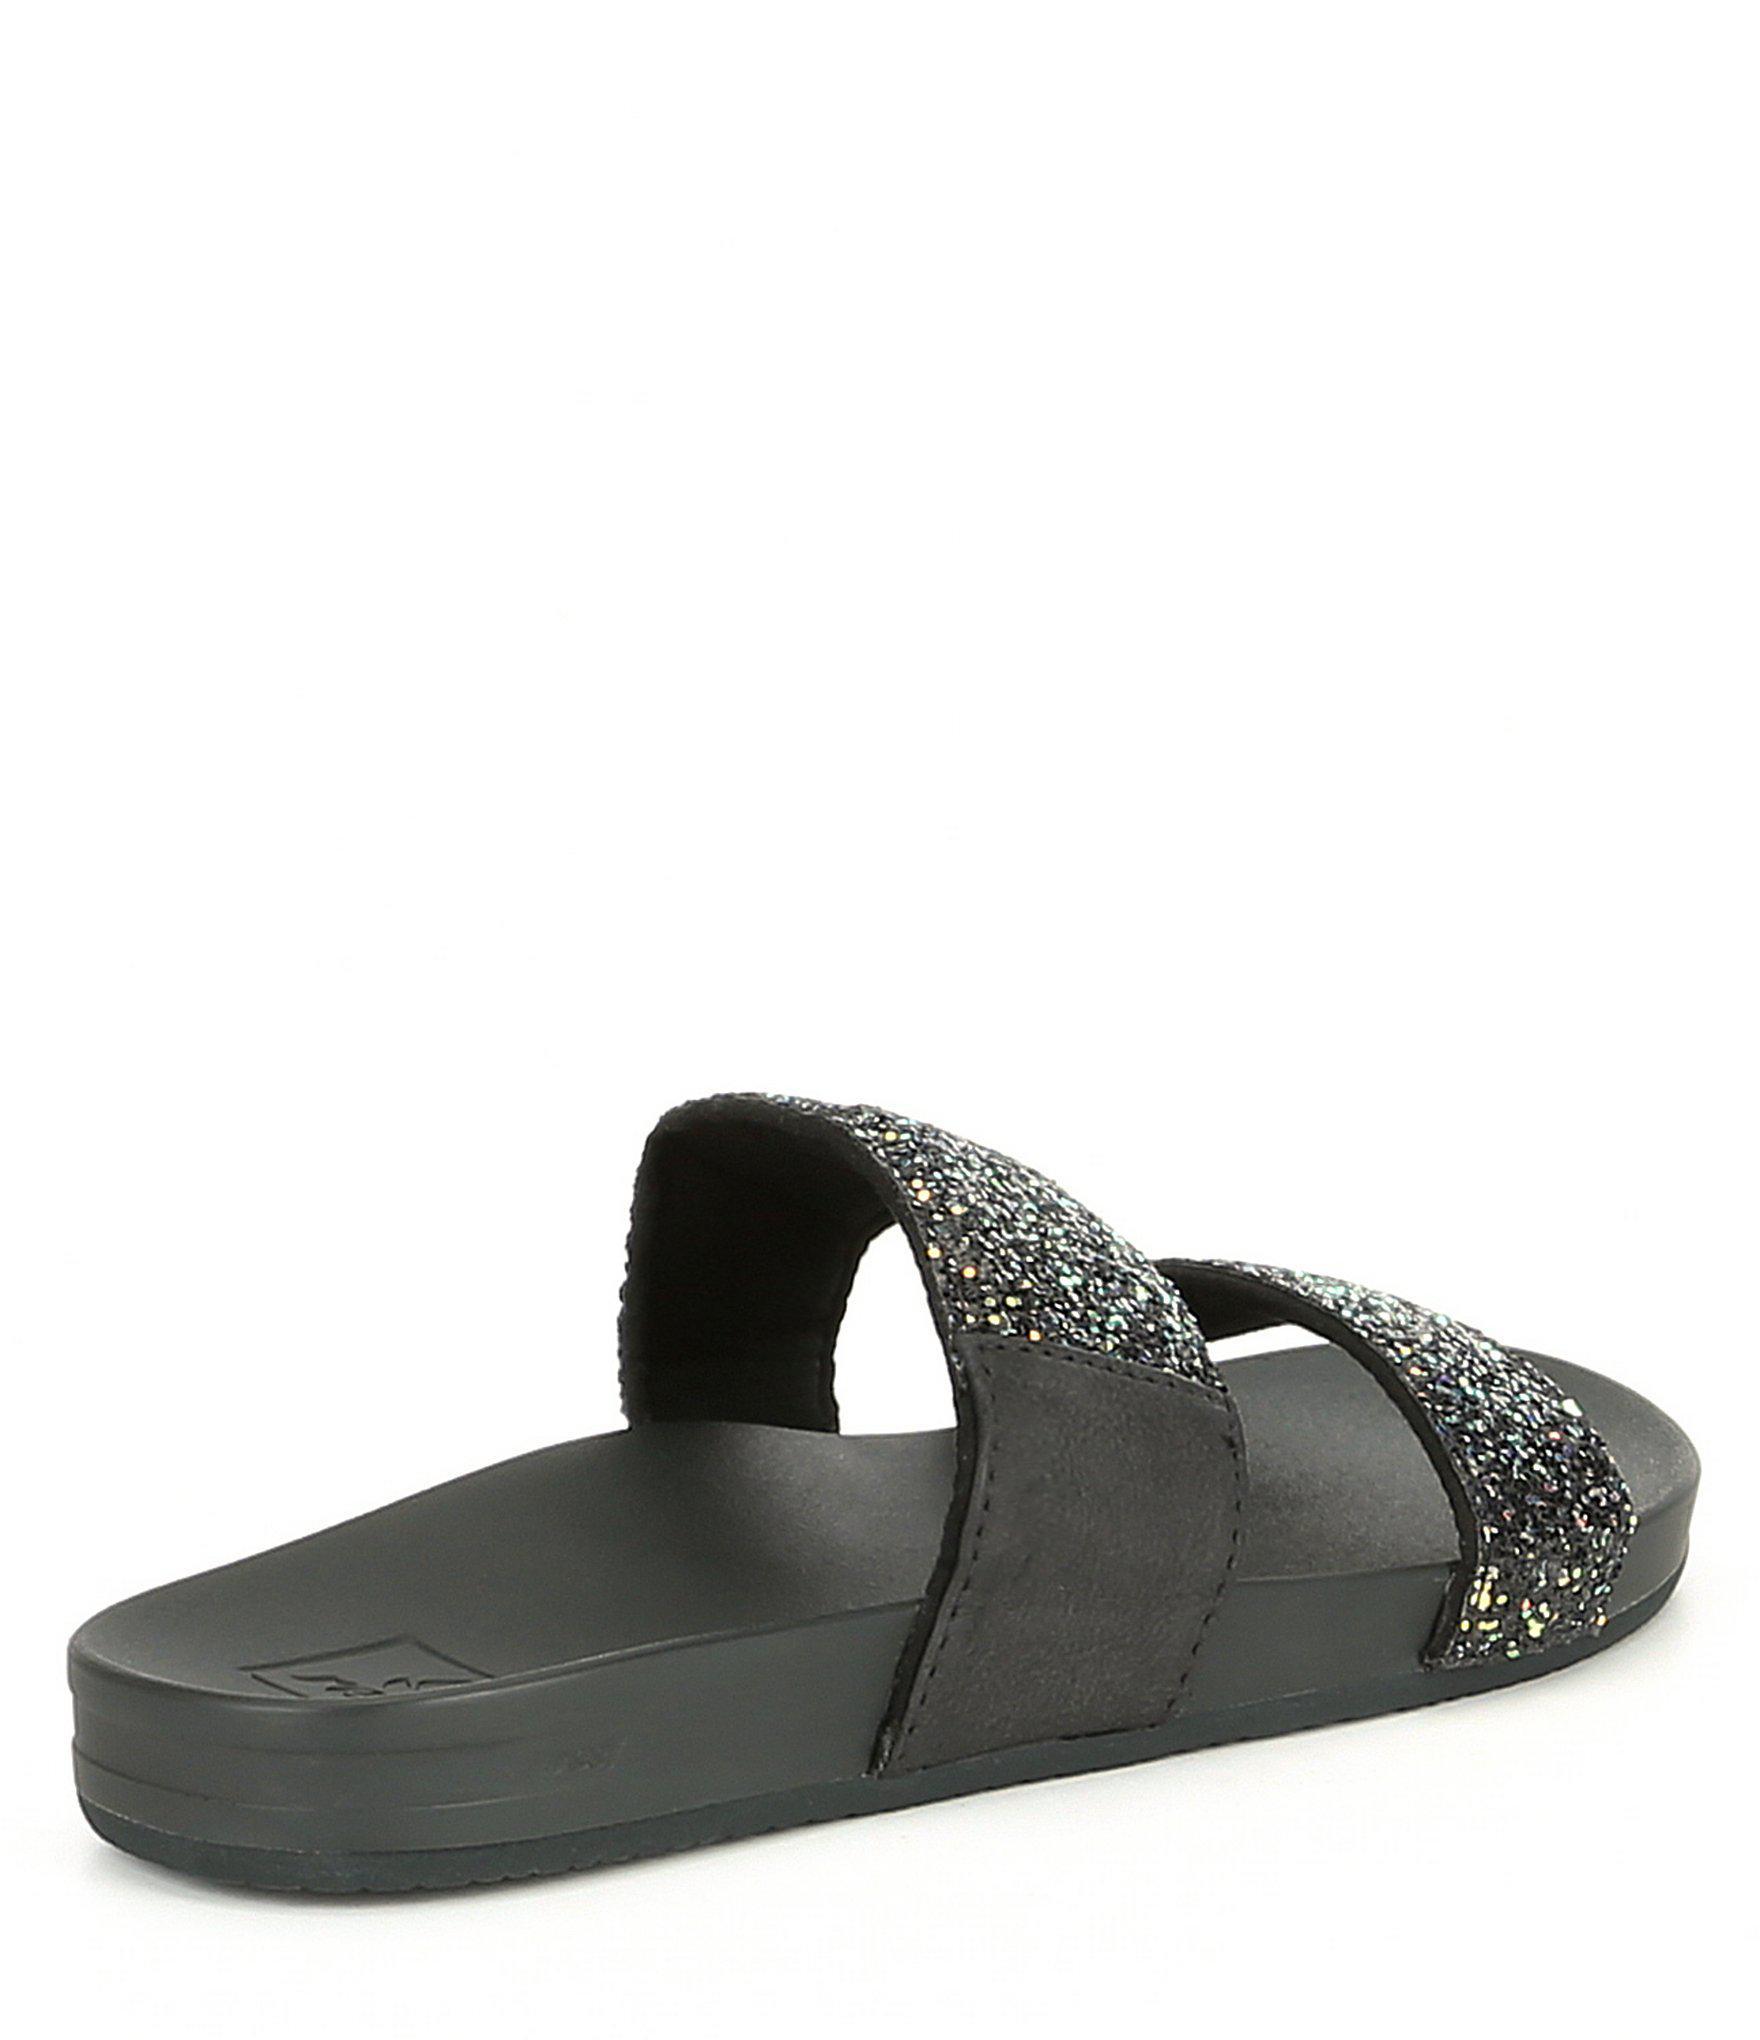 47da87dc84d8 Reef - Black Cushion Bounce Vista Sandals - Lyst. View fullscreen